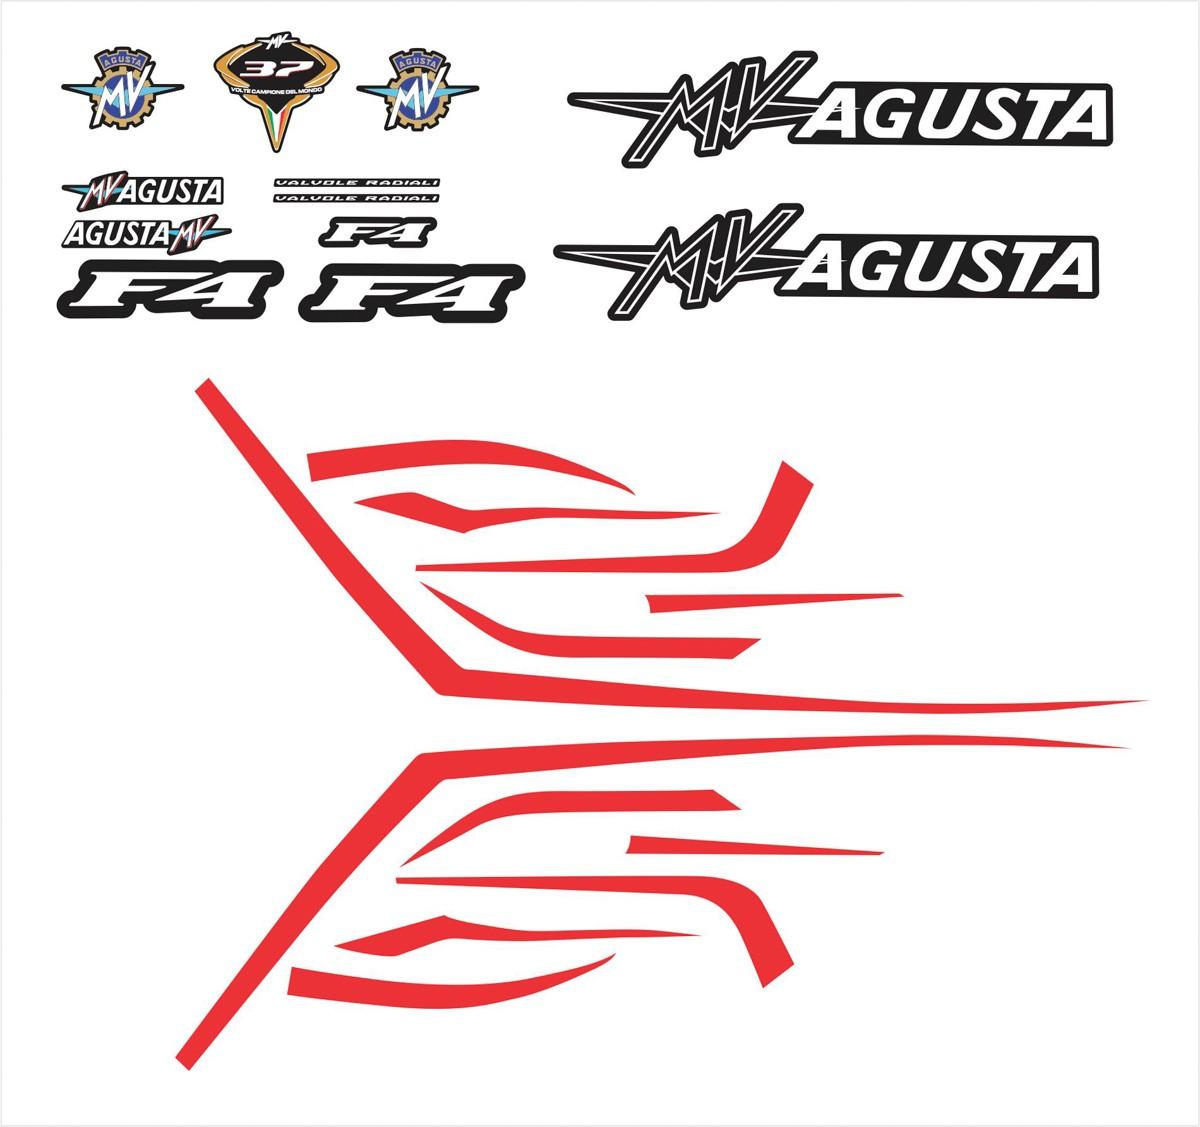 Kit Adesivo Mv Agusta F4 2014 Preta Ag013